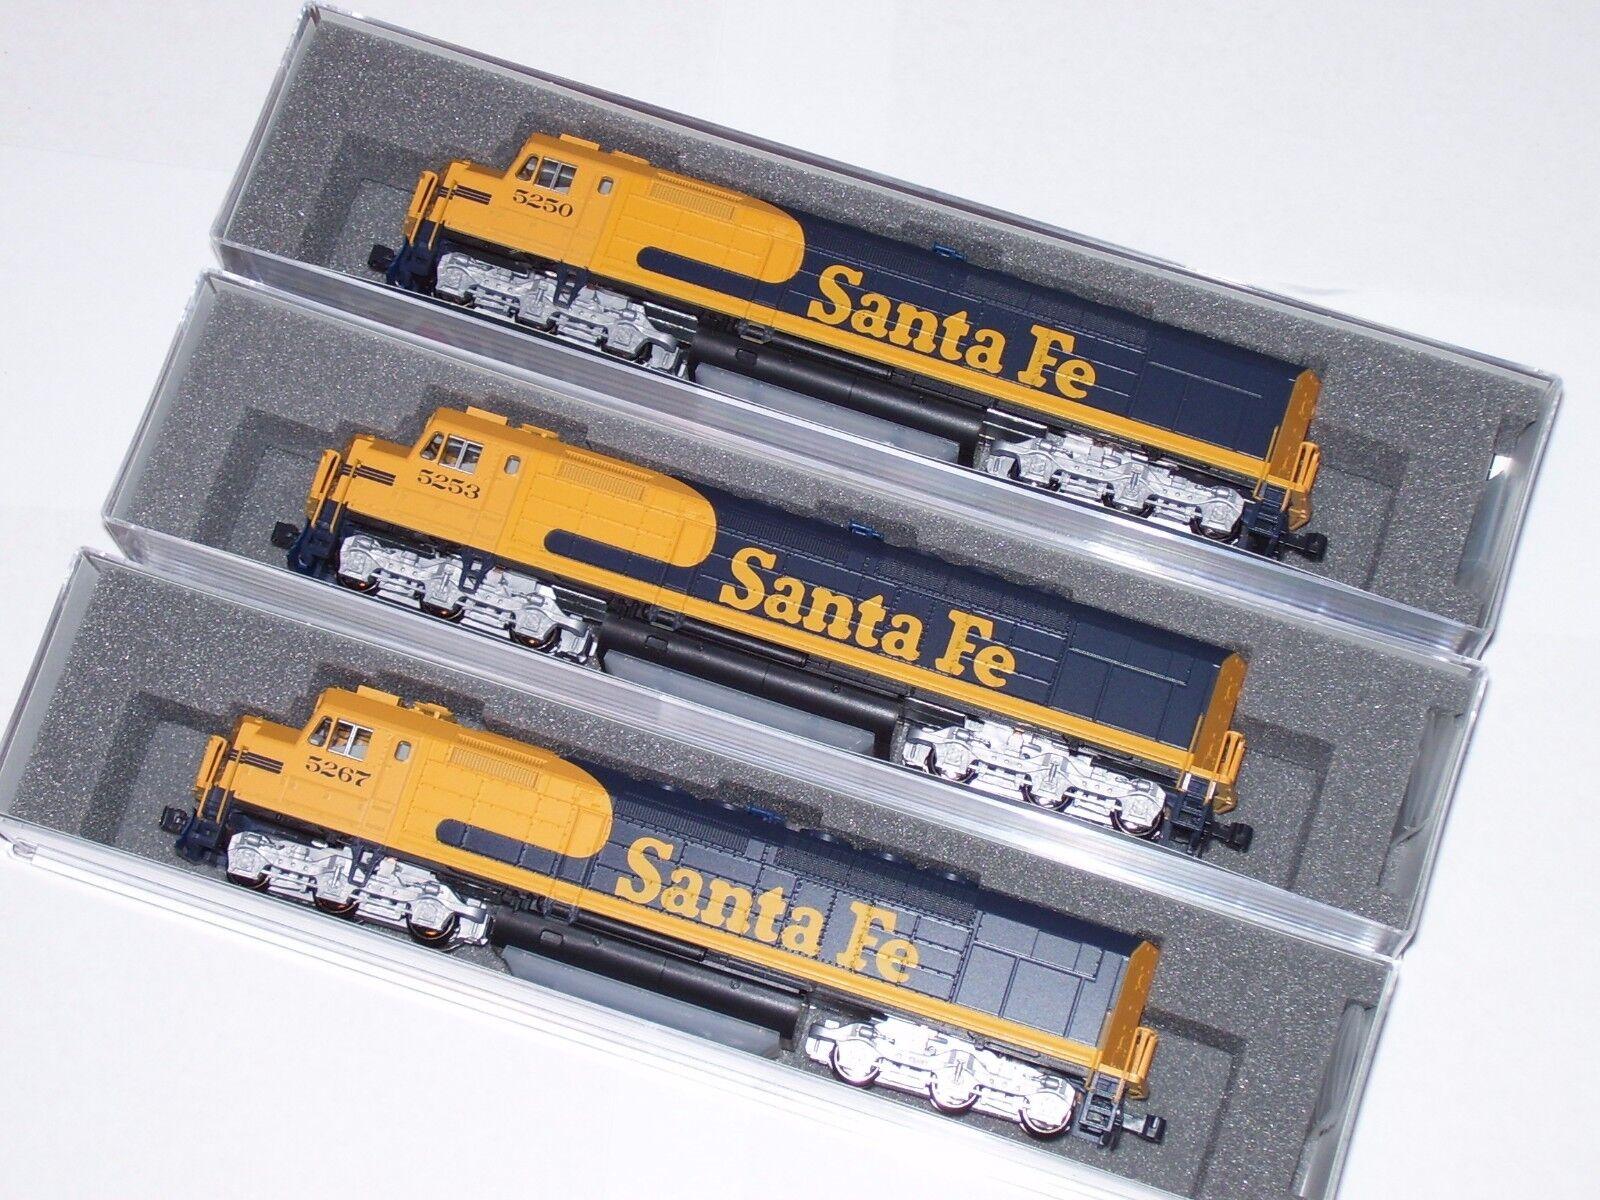 Kato N  Santa Fe 3 Loco Set 1769211DCC 1769212DCC 1769213DCC  SDP40F Type IVa